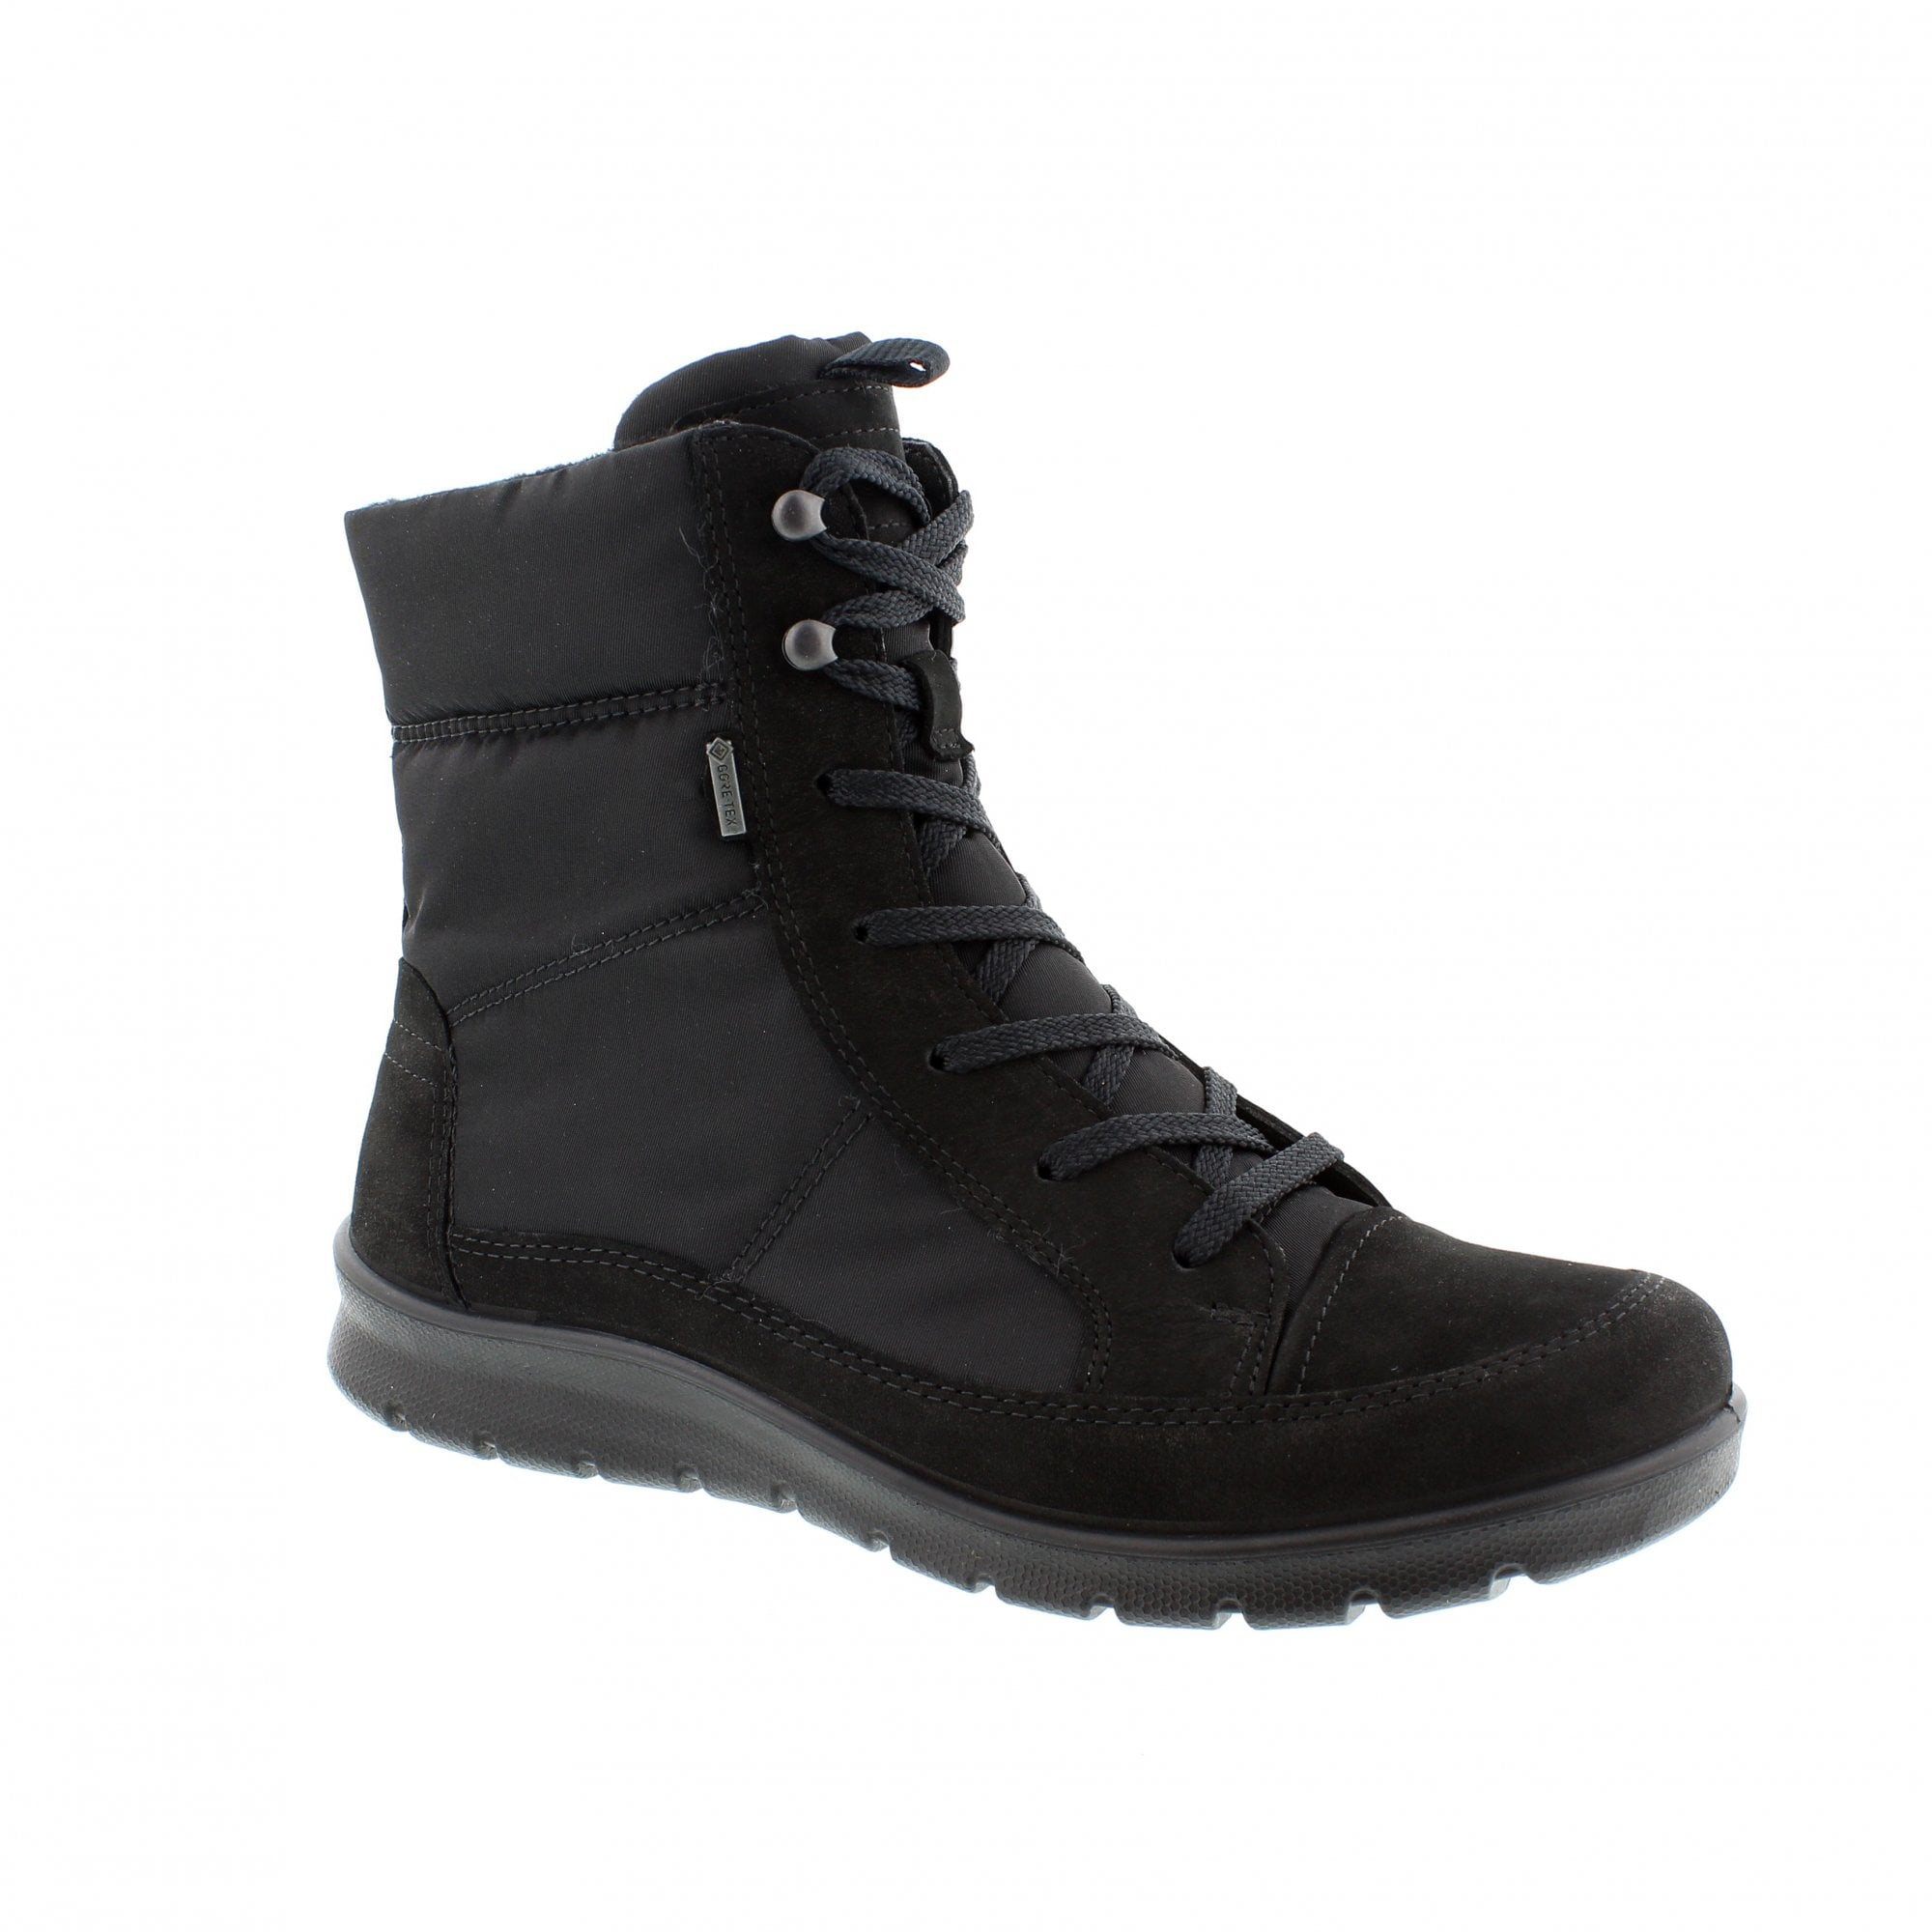 66e10de90975 Ecco Babett 215553-02001 Womens Ankle Boots